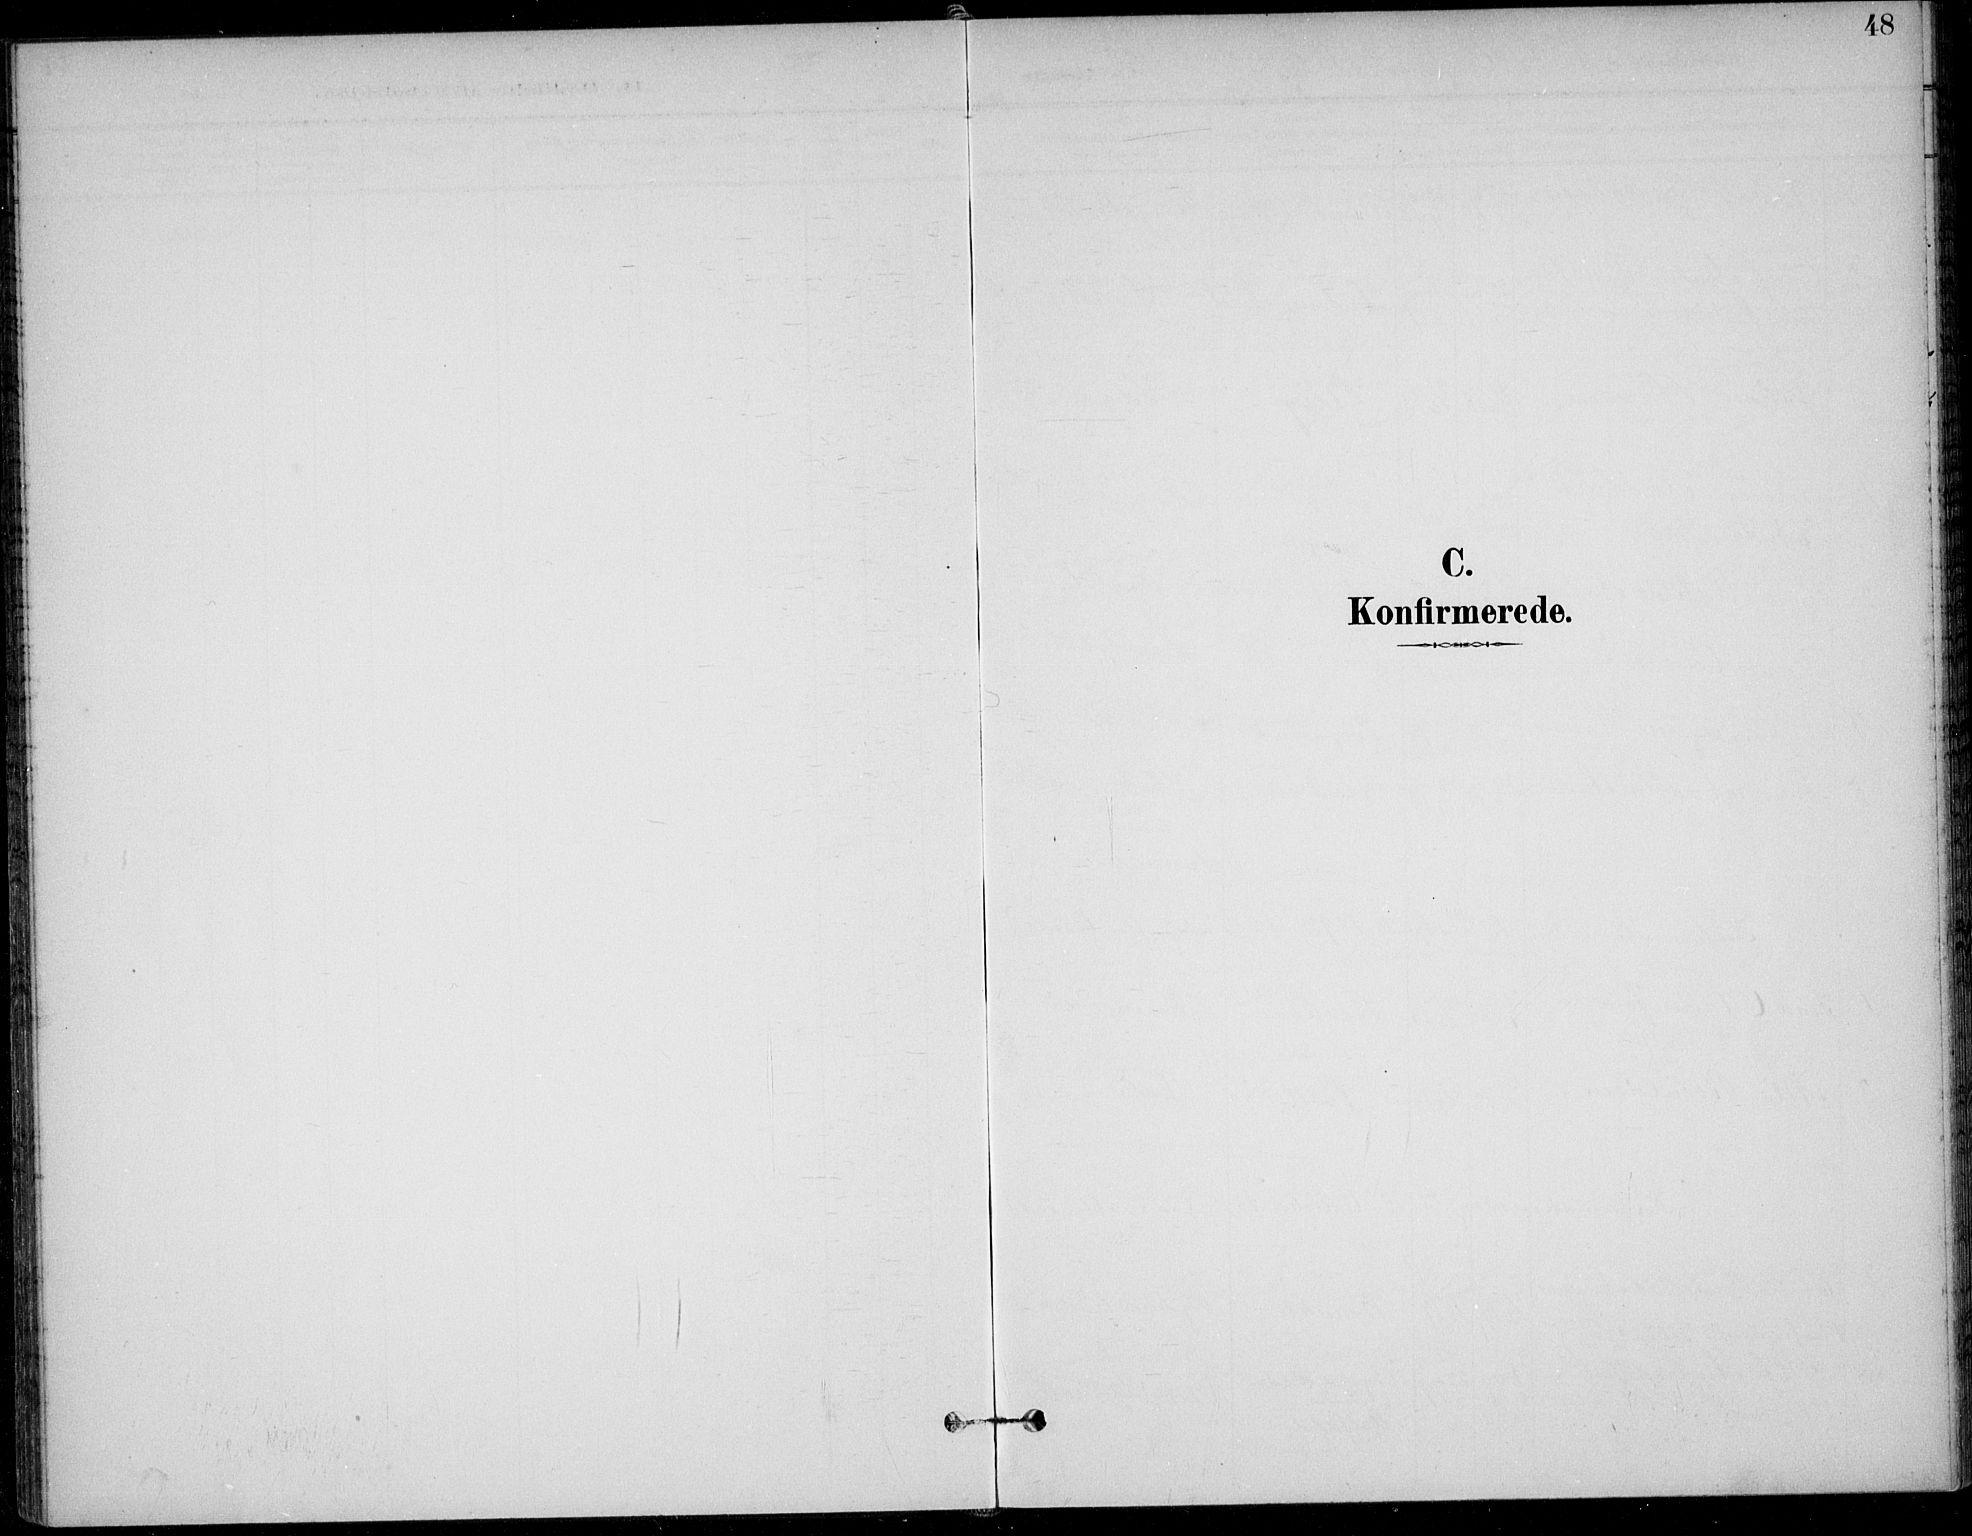 SAKO, Solum kirkebøker, F/Fc/L0002: Ministerialbok nr. III 2, 1892-1906, s. 48